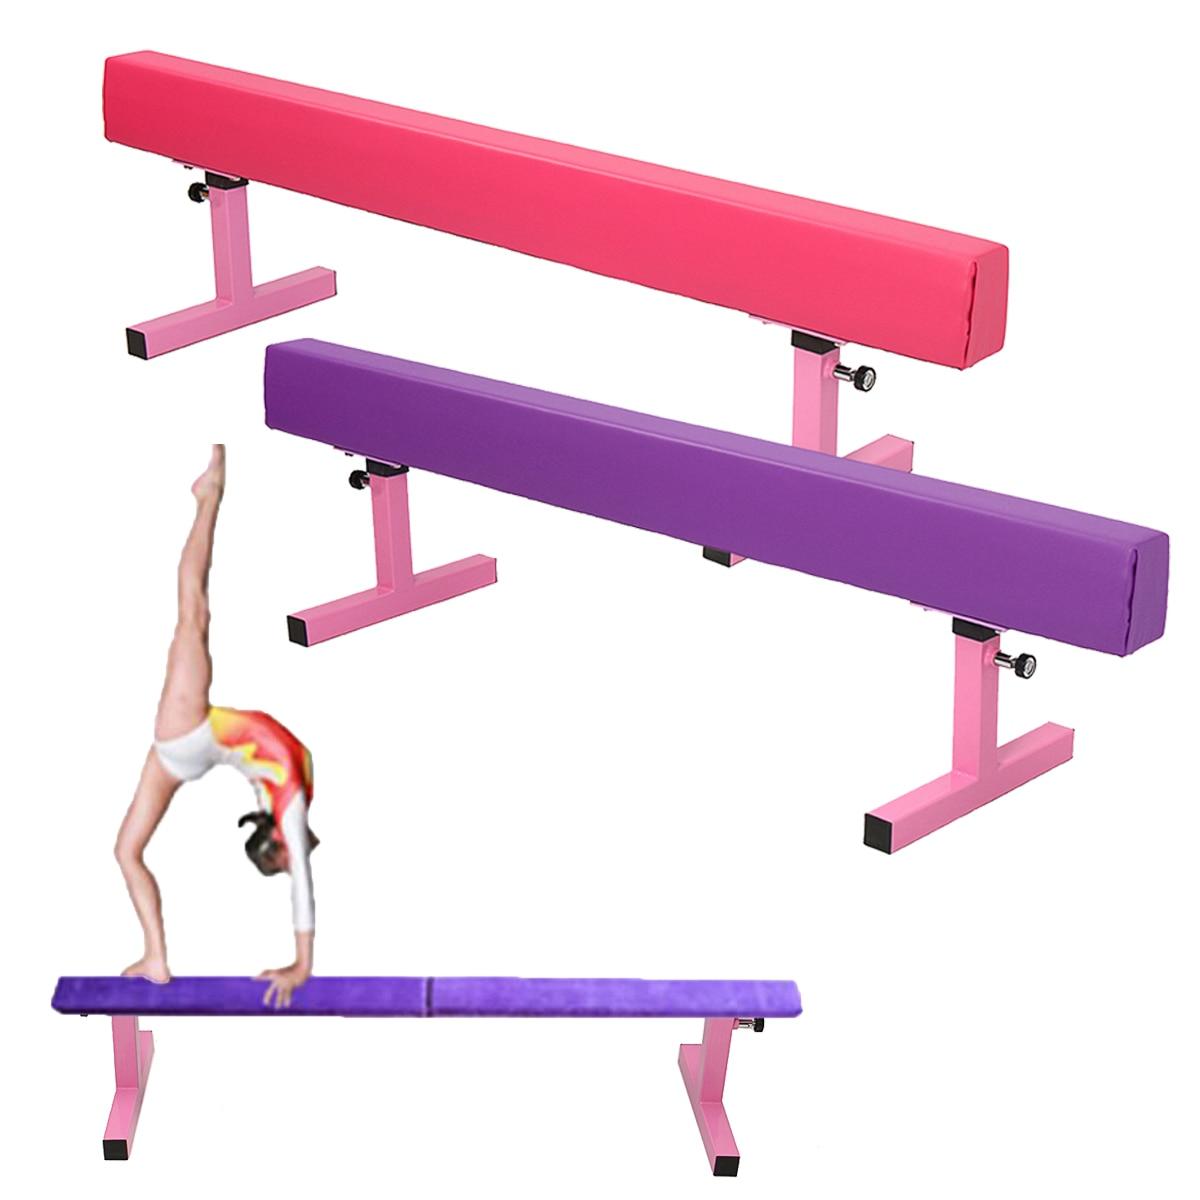 Gymnastics Balance Beam Gymnastics Cushion 1.8M 6ft High Home Gym Fitness Training Tool Training Equipment primary gymnastics